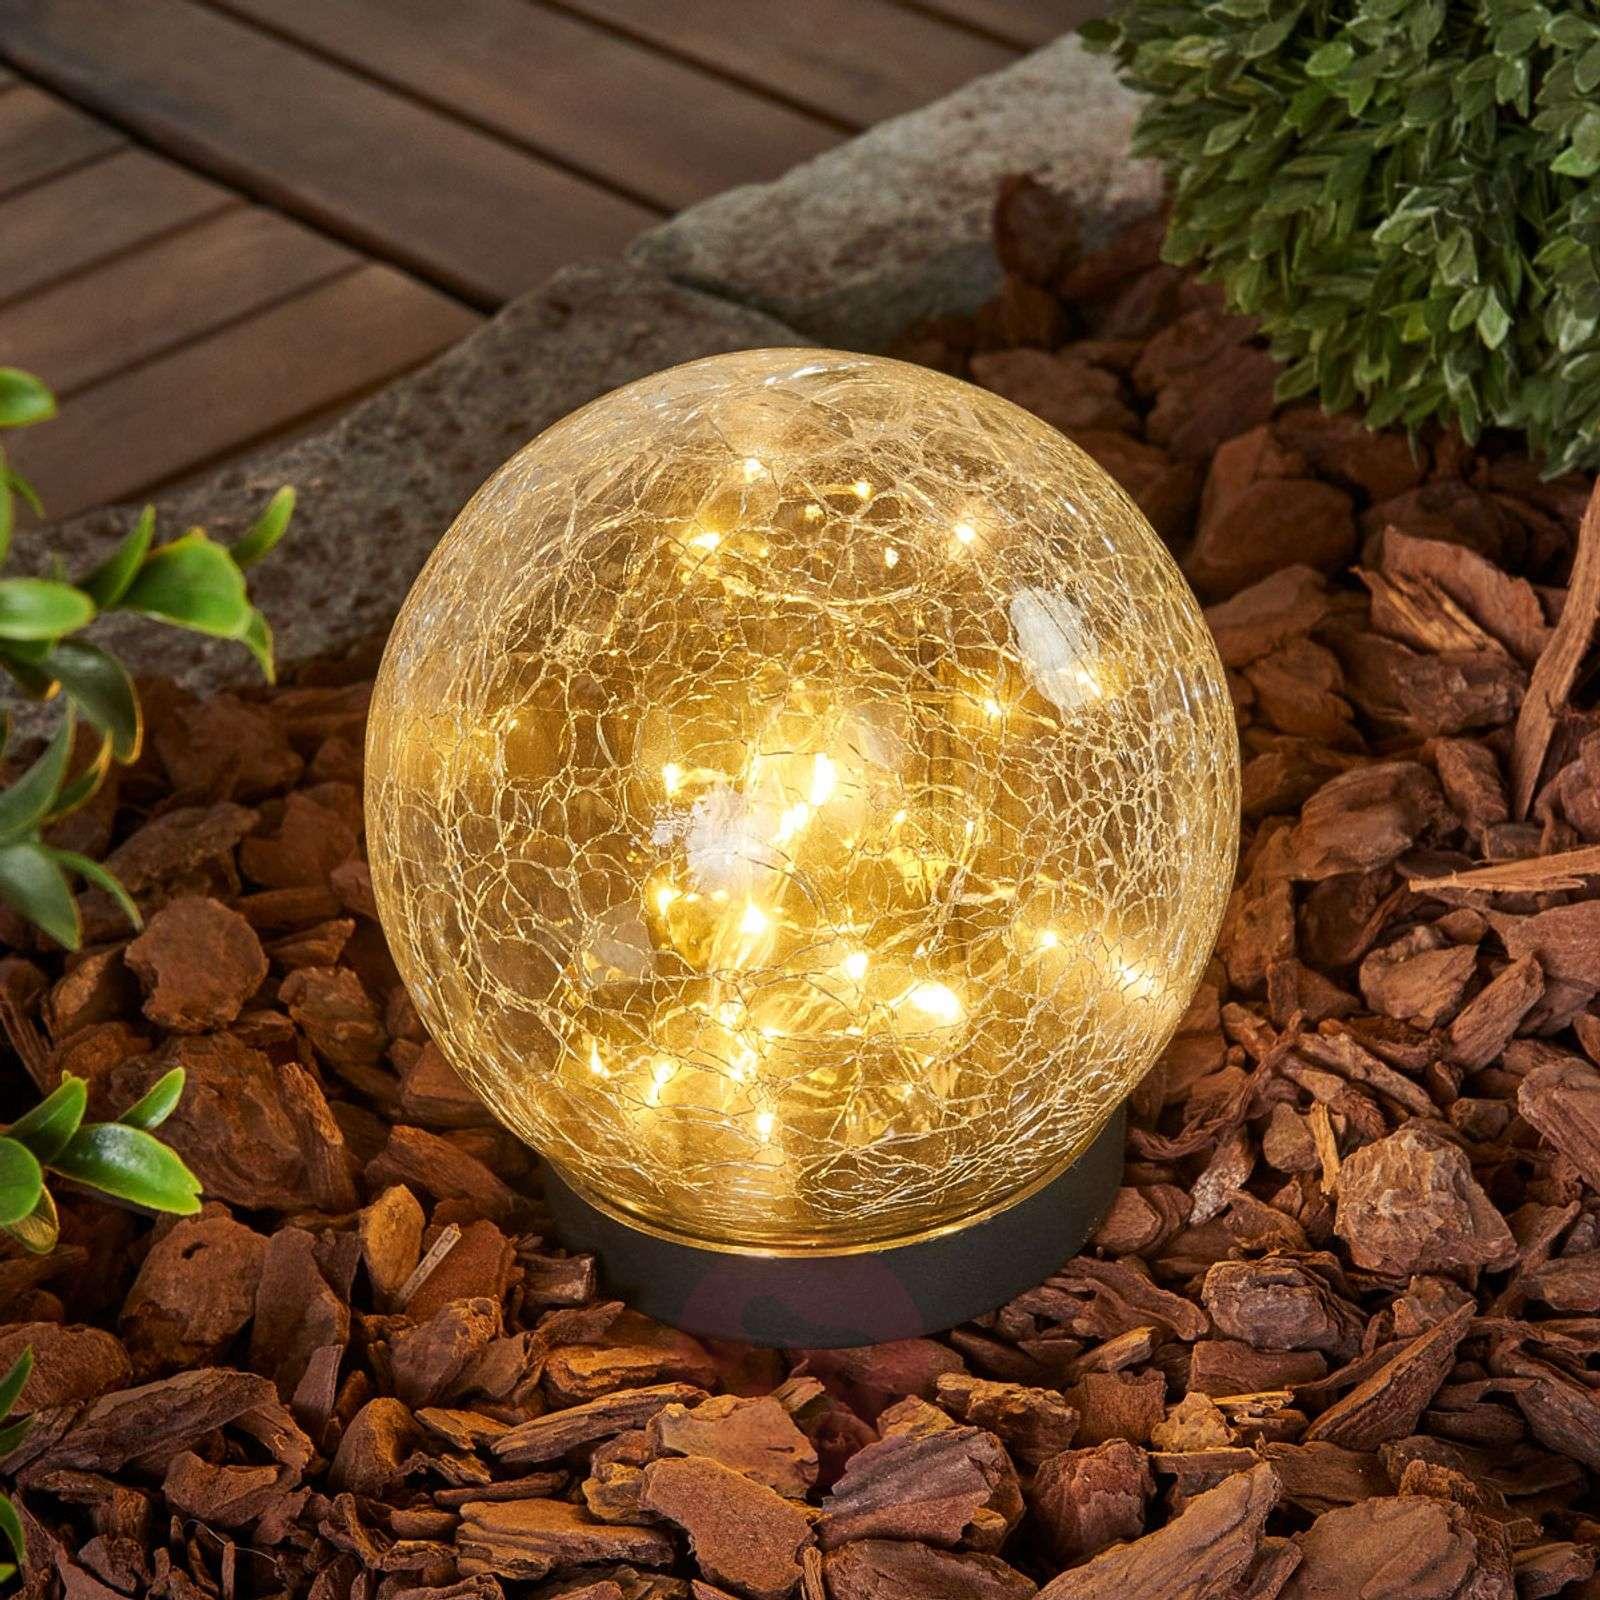 Glory spherical solar table lamp-1523060-01